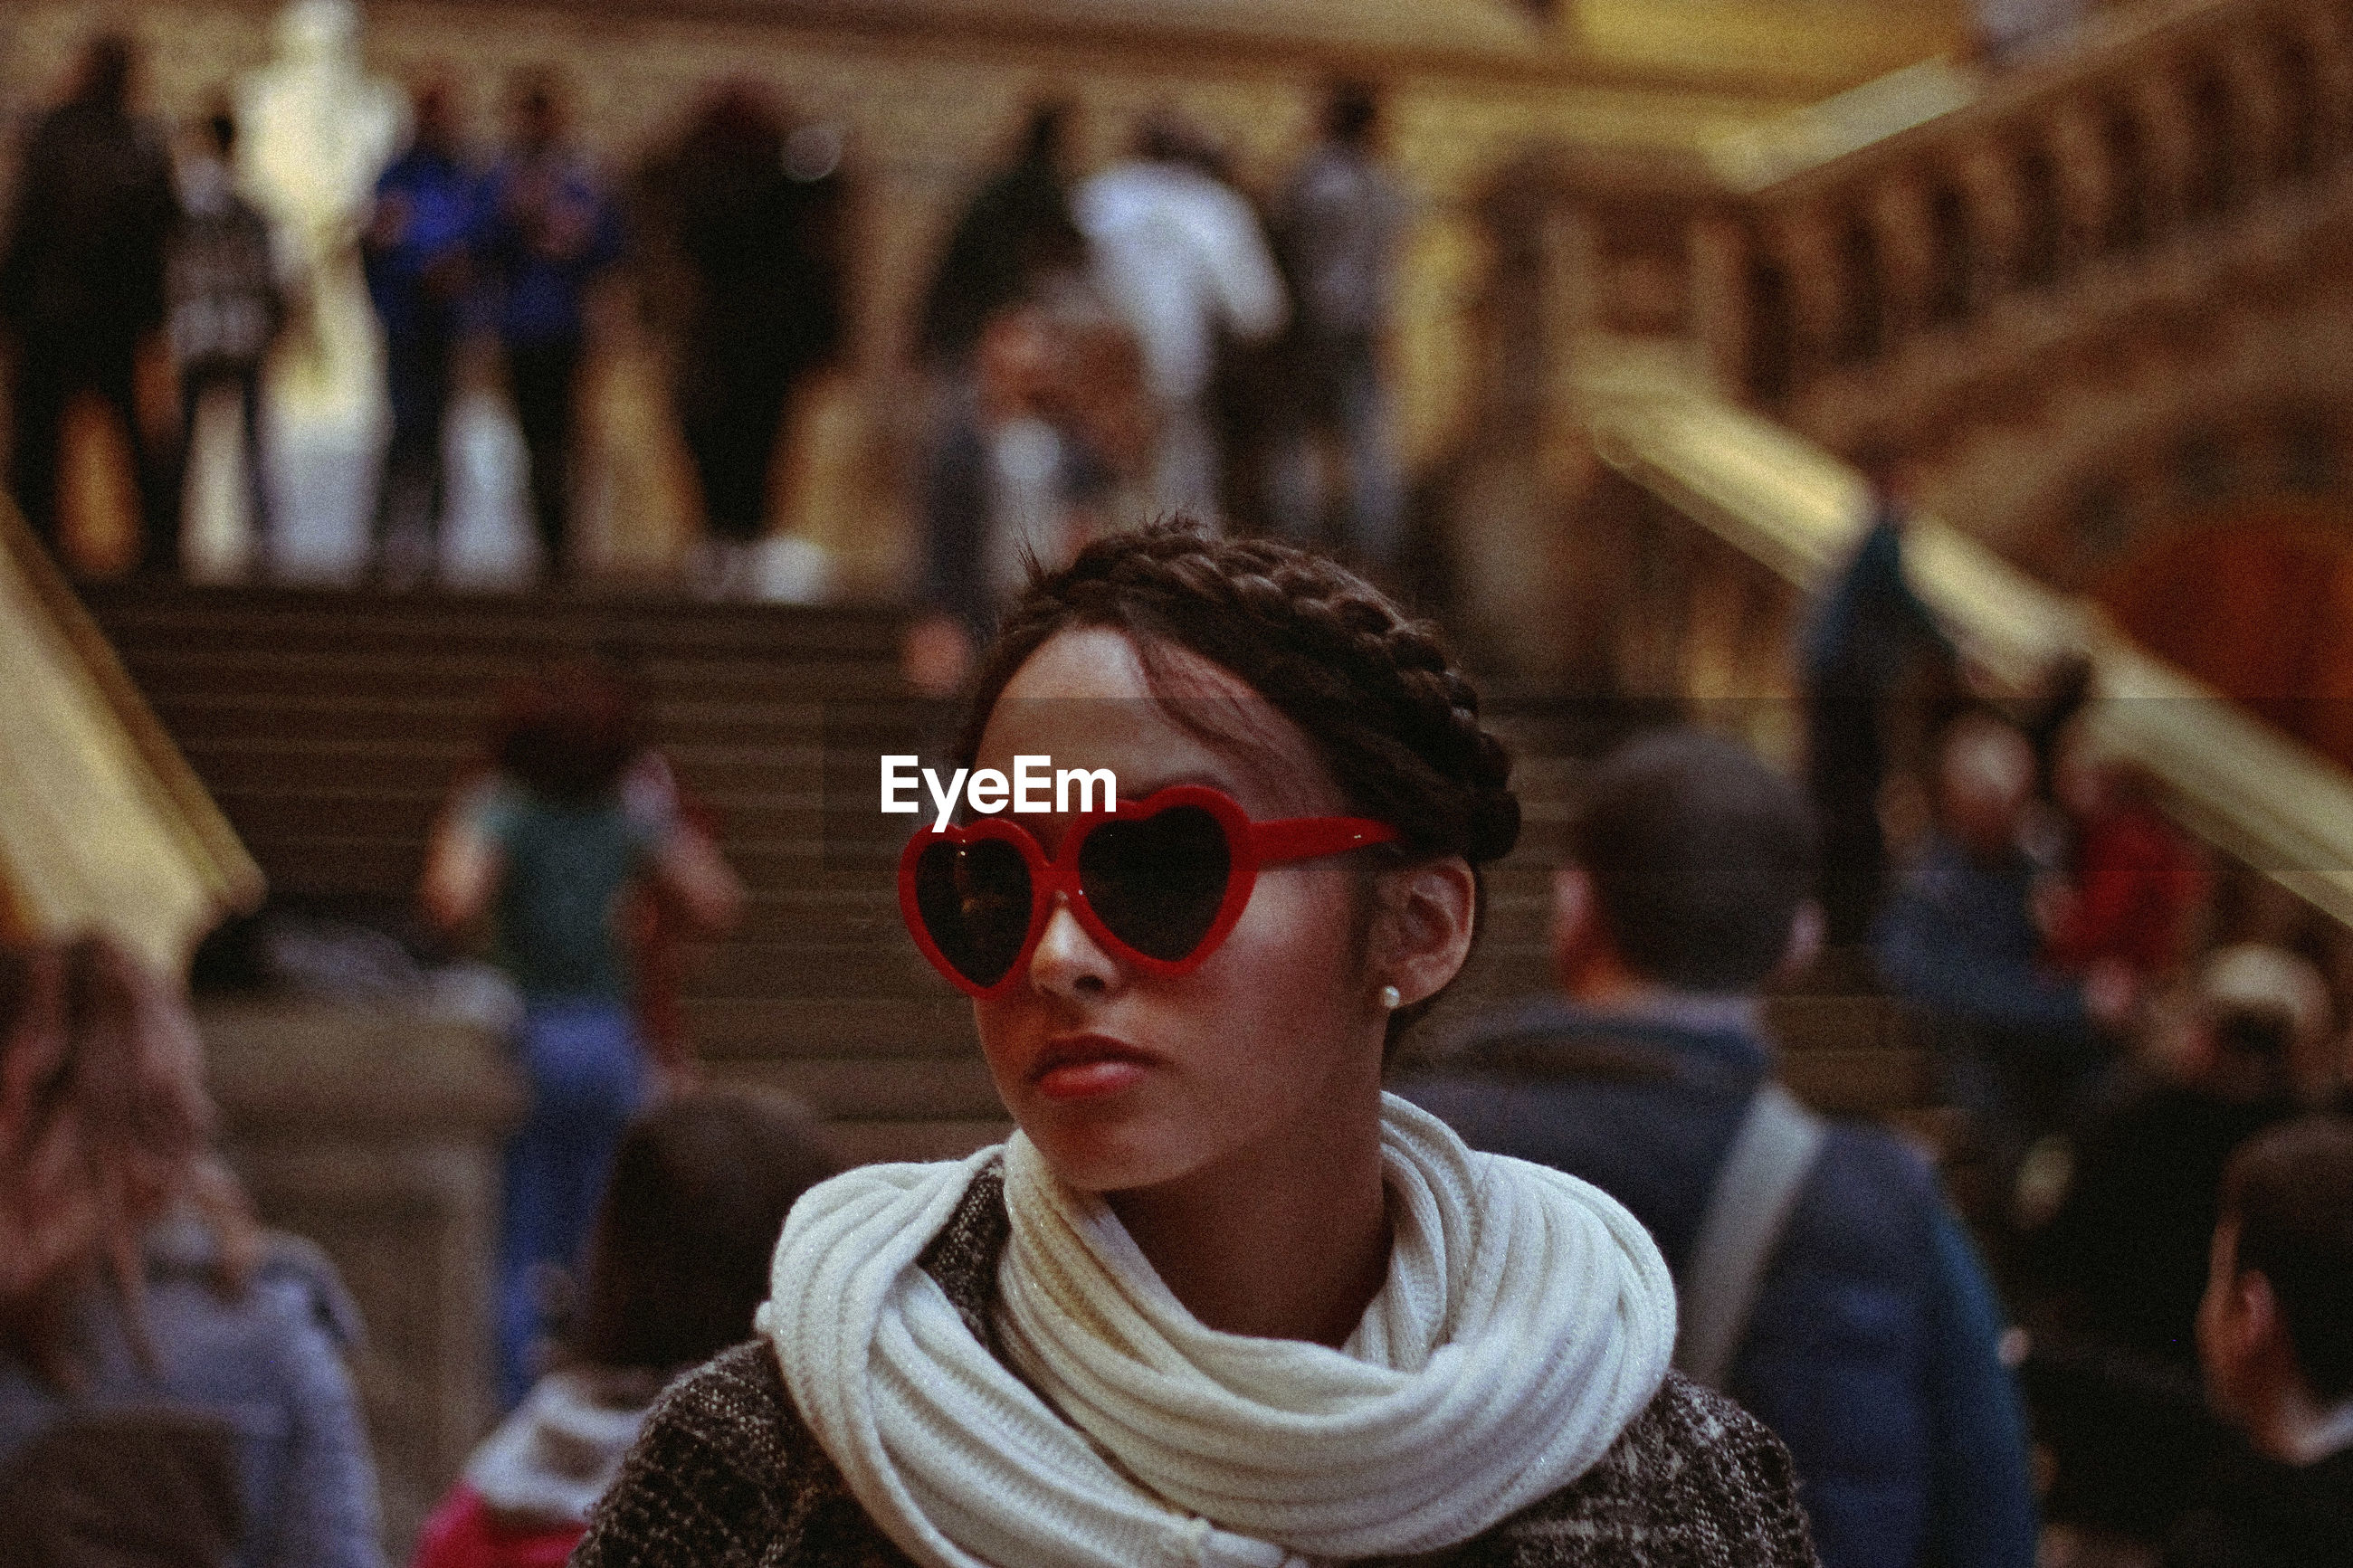 Teenage girl wearing novelty glasses in city